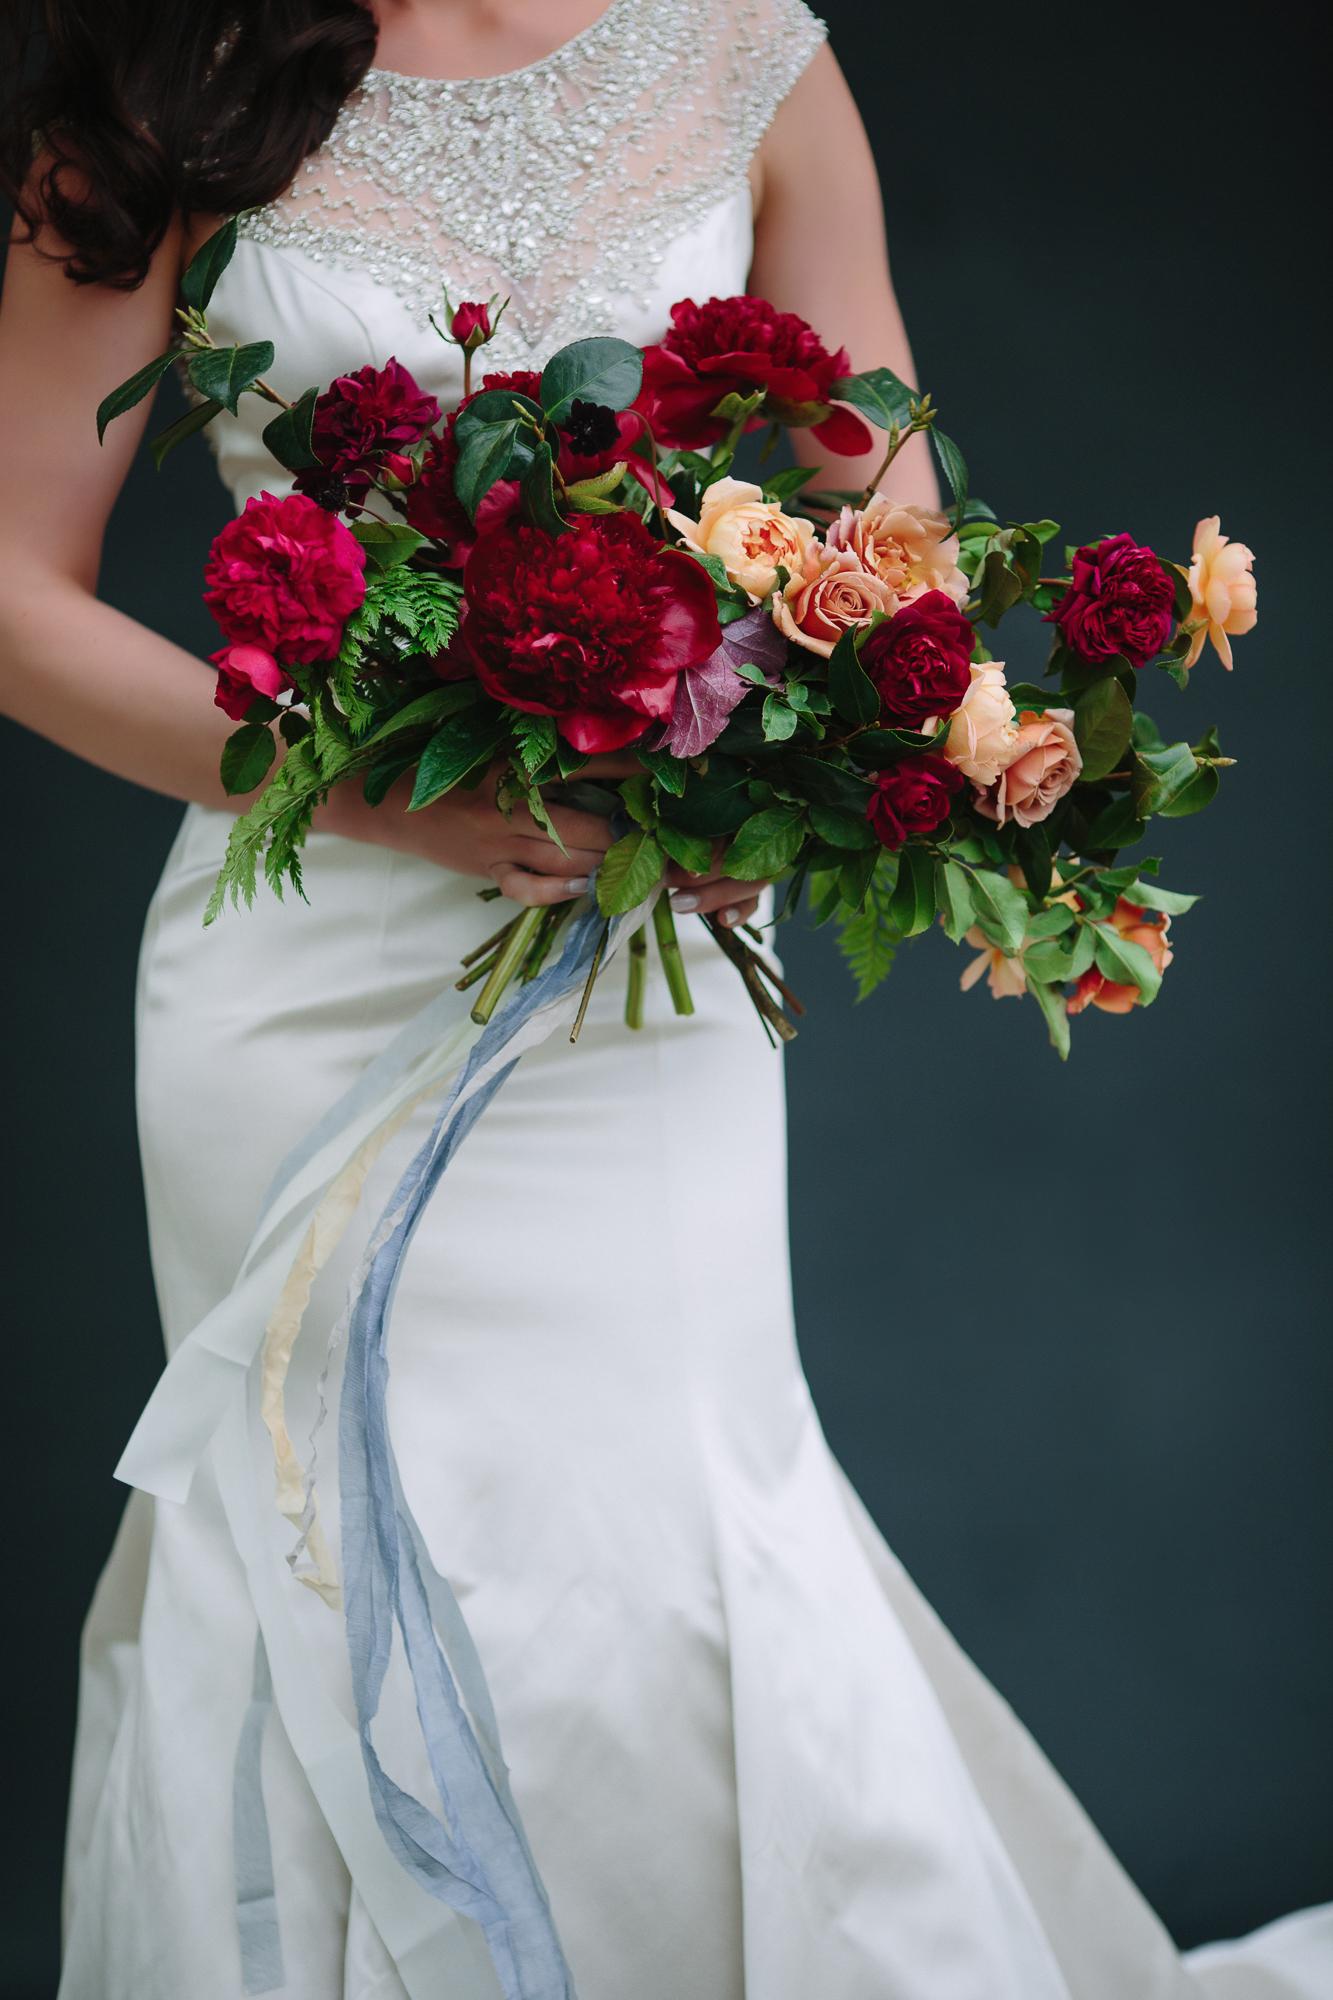 Jewel toned wedding bouquet flowers